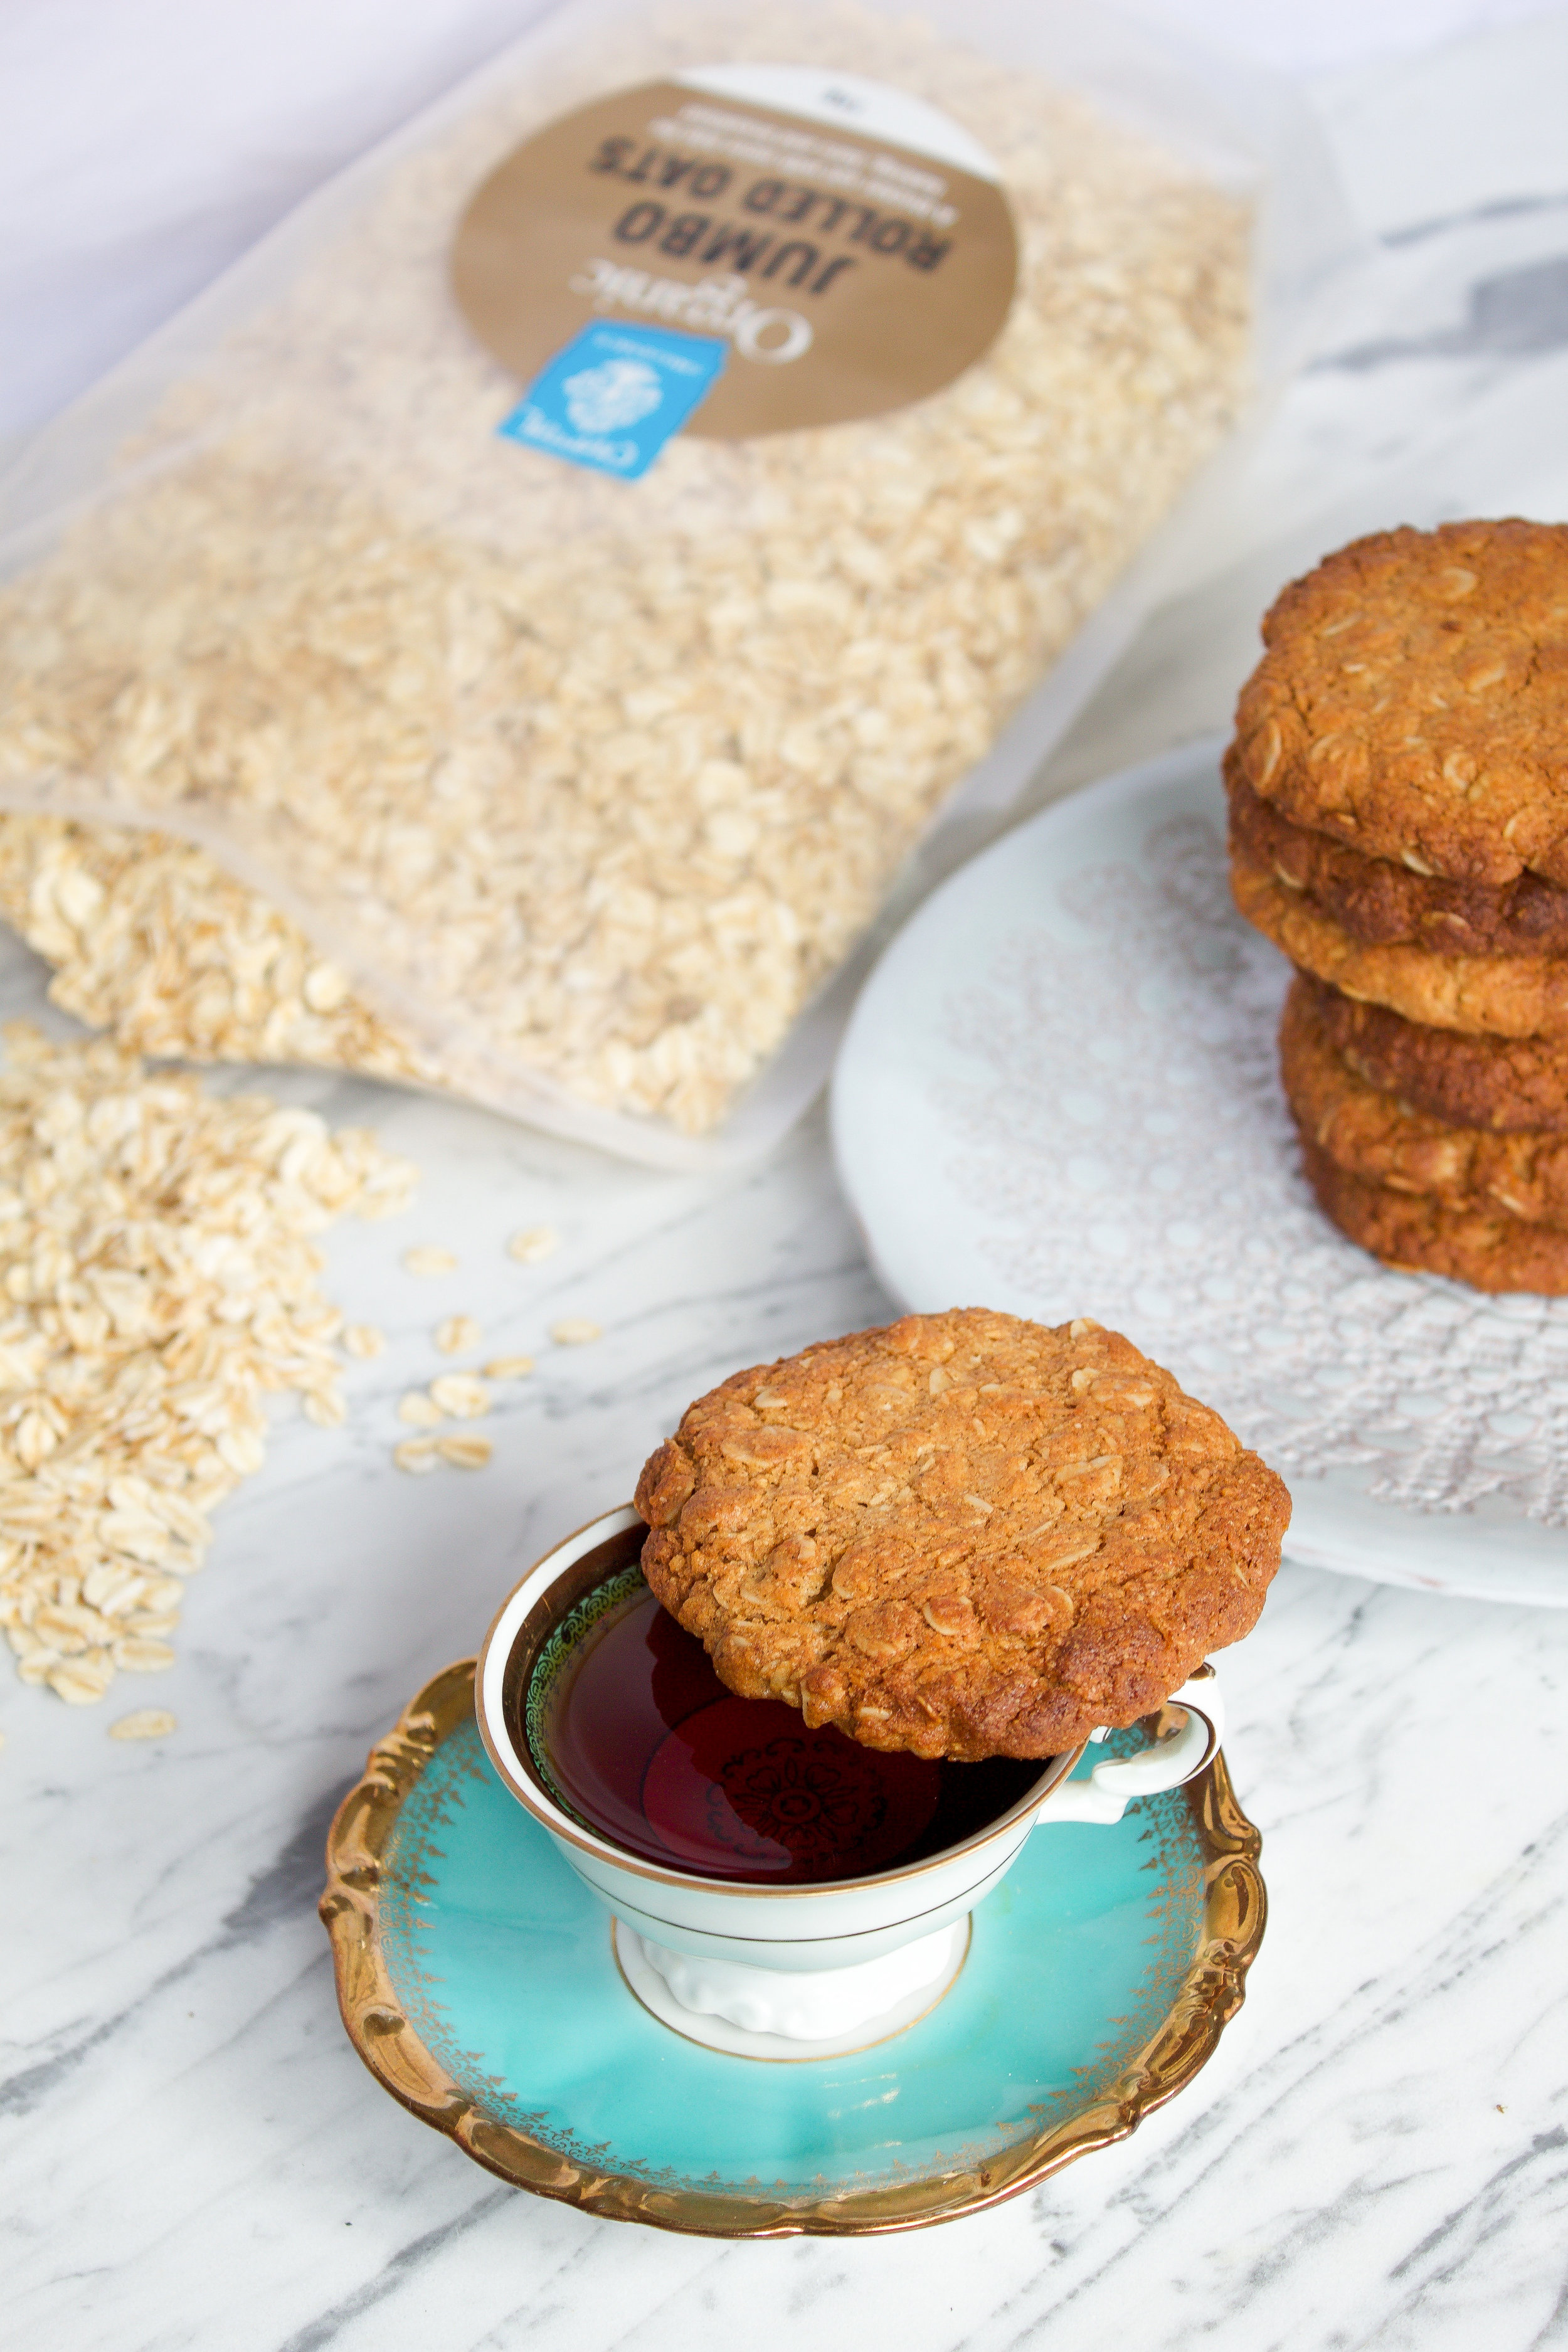 healthy anzac biscuits recipe, gluten free, sugar free, vegan, dairy free